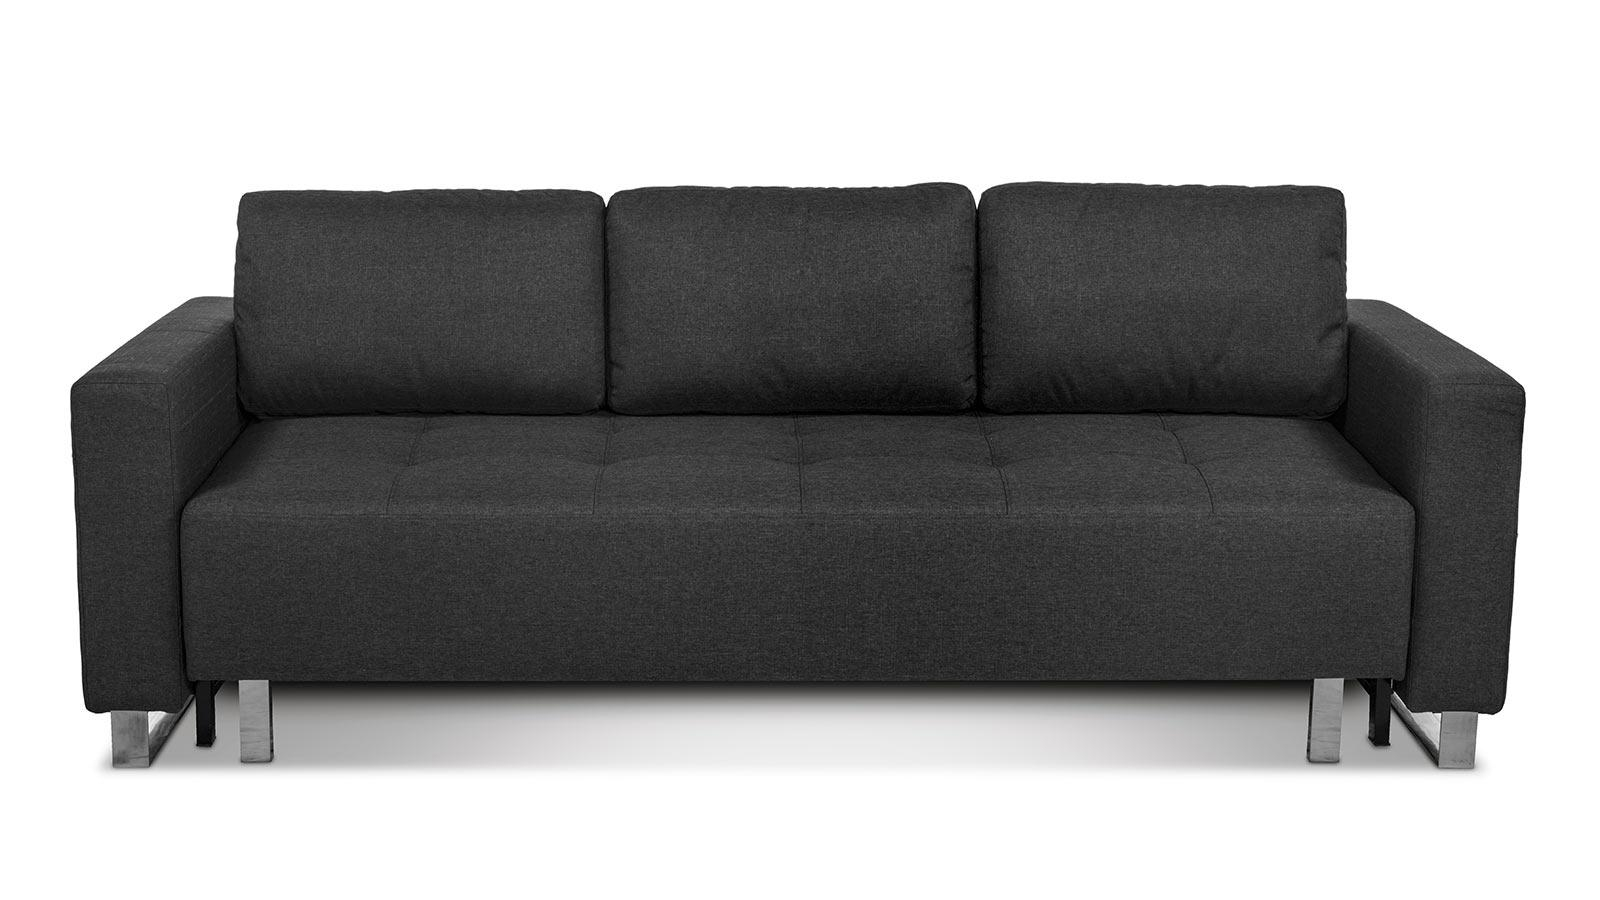 bay sofa klik klak sleeper dubois bed review 20 collection of the sofas ideas